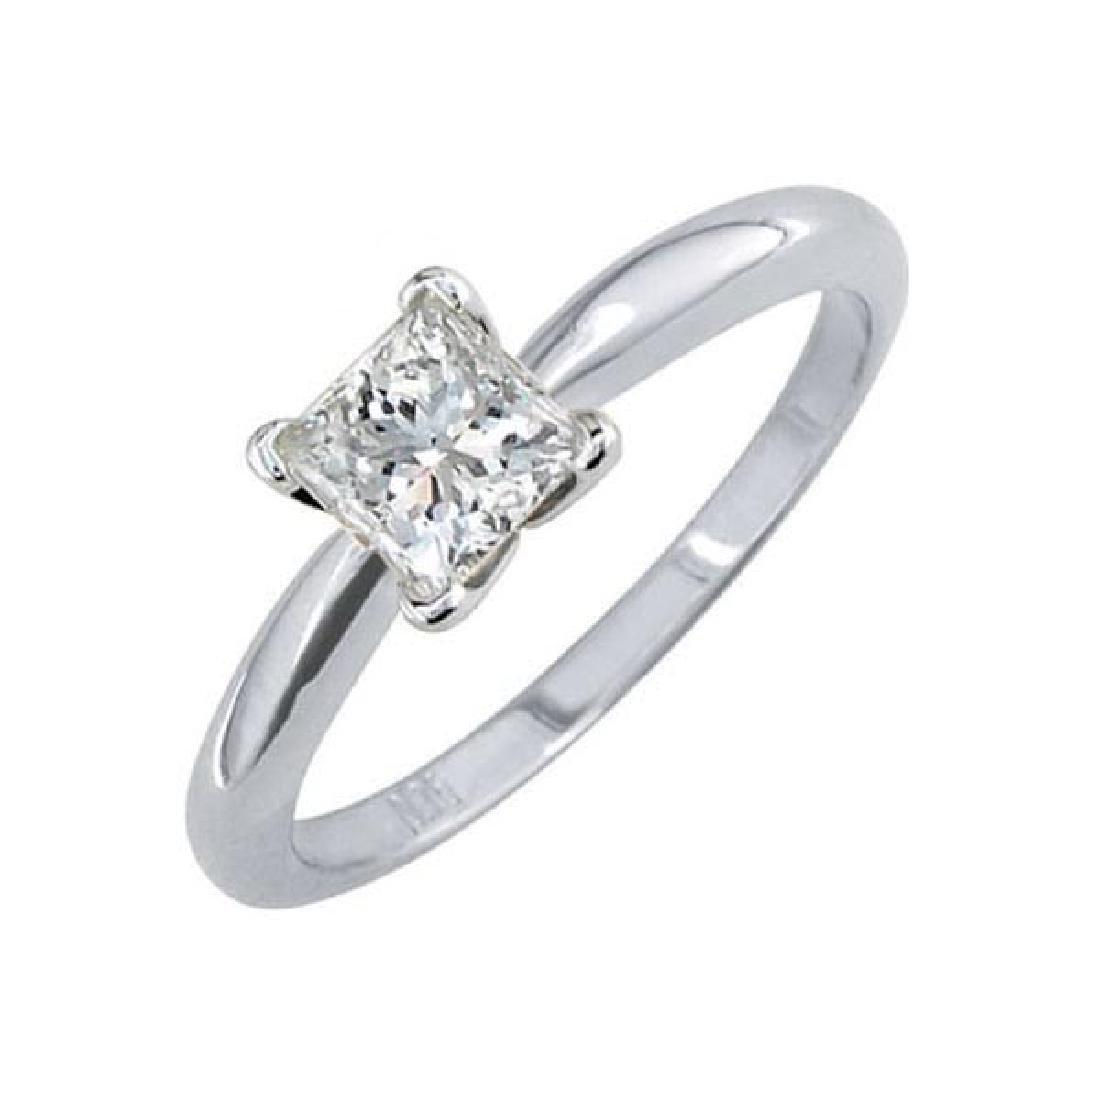 Certified 1.2 CTW Princess Diamond Solitaire 14k Ring H